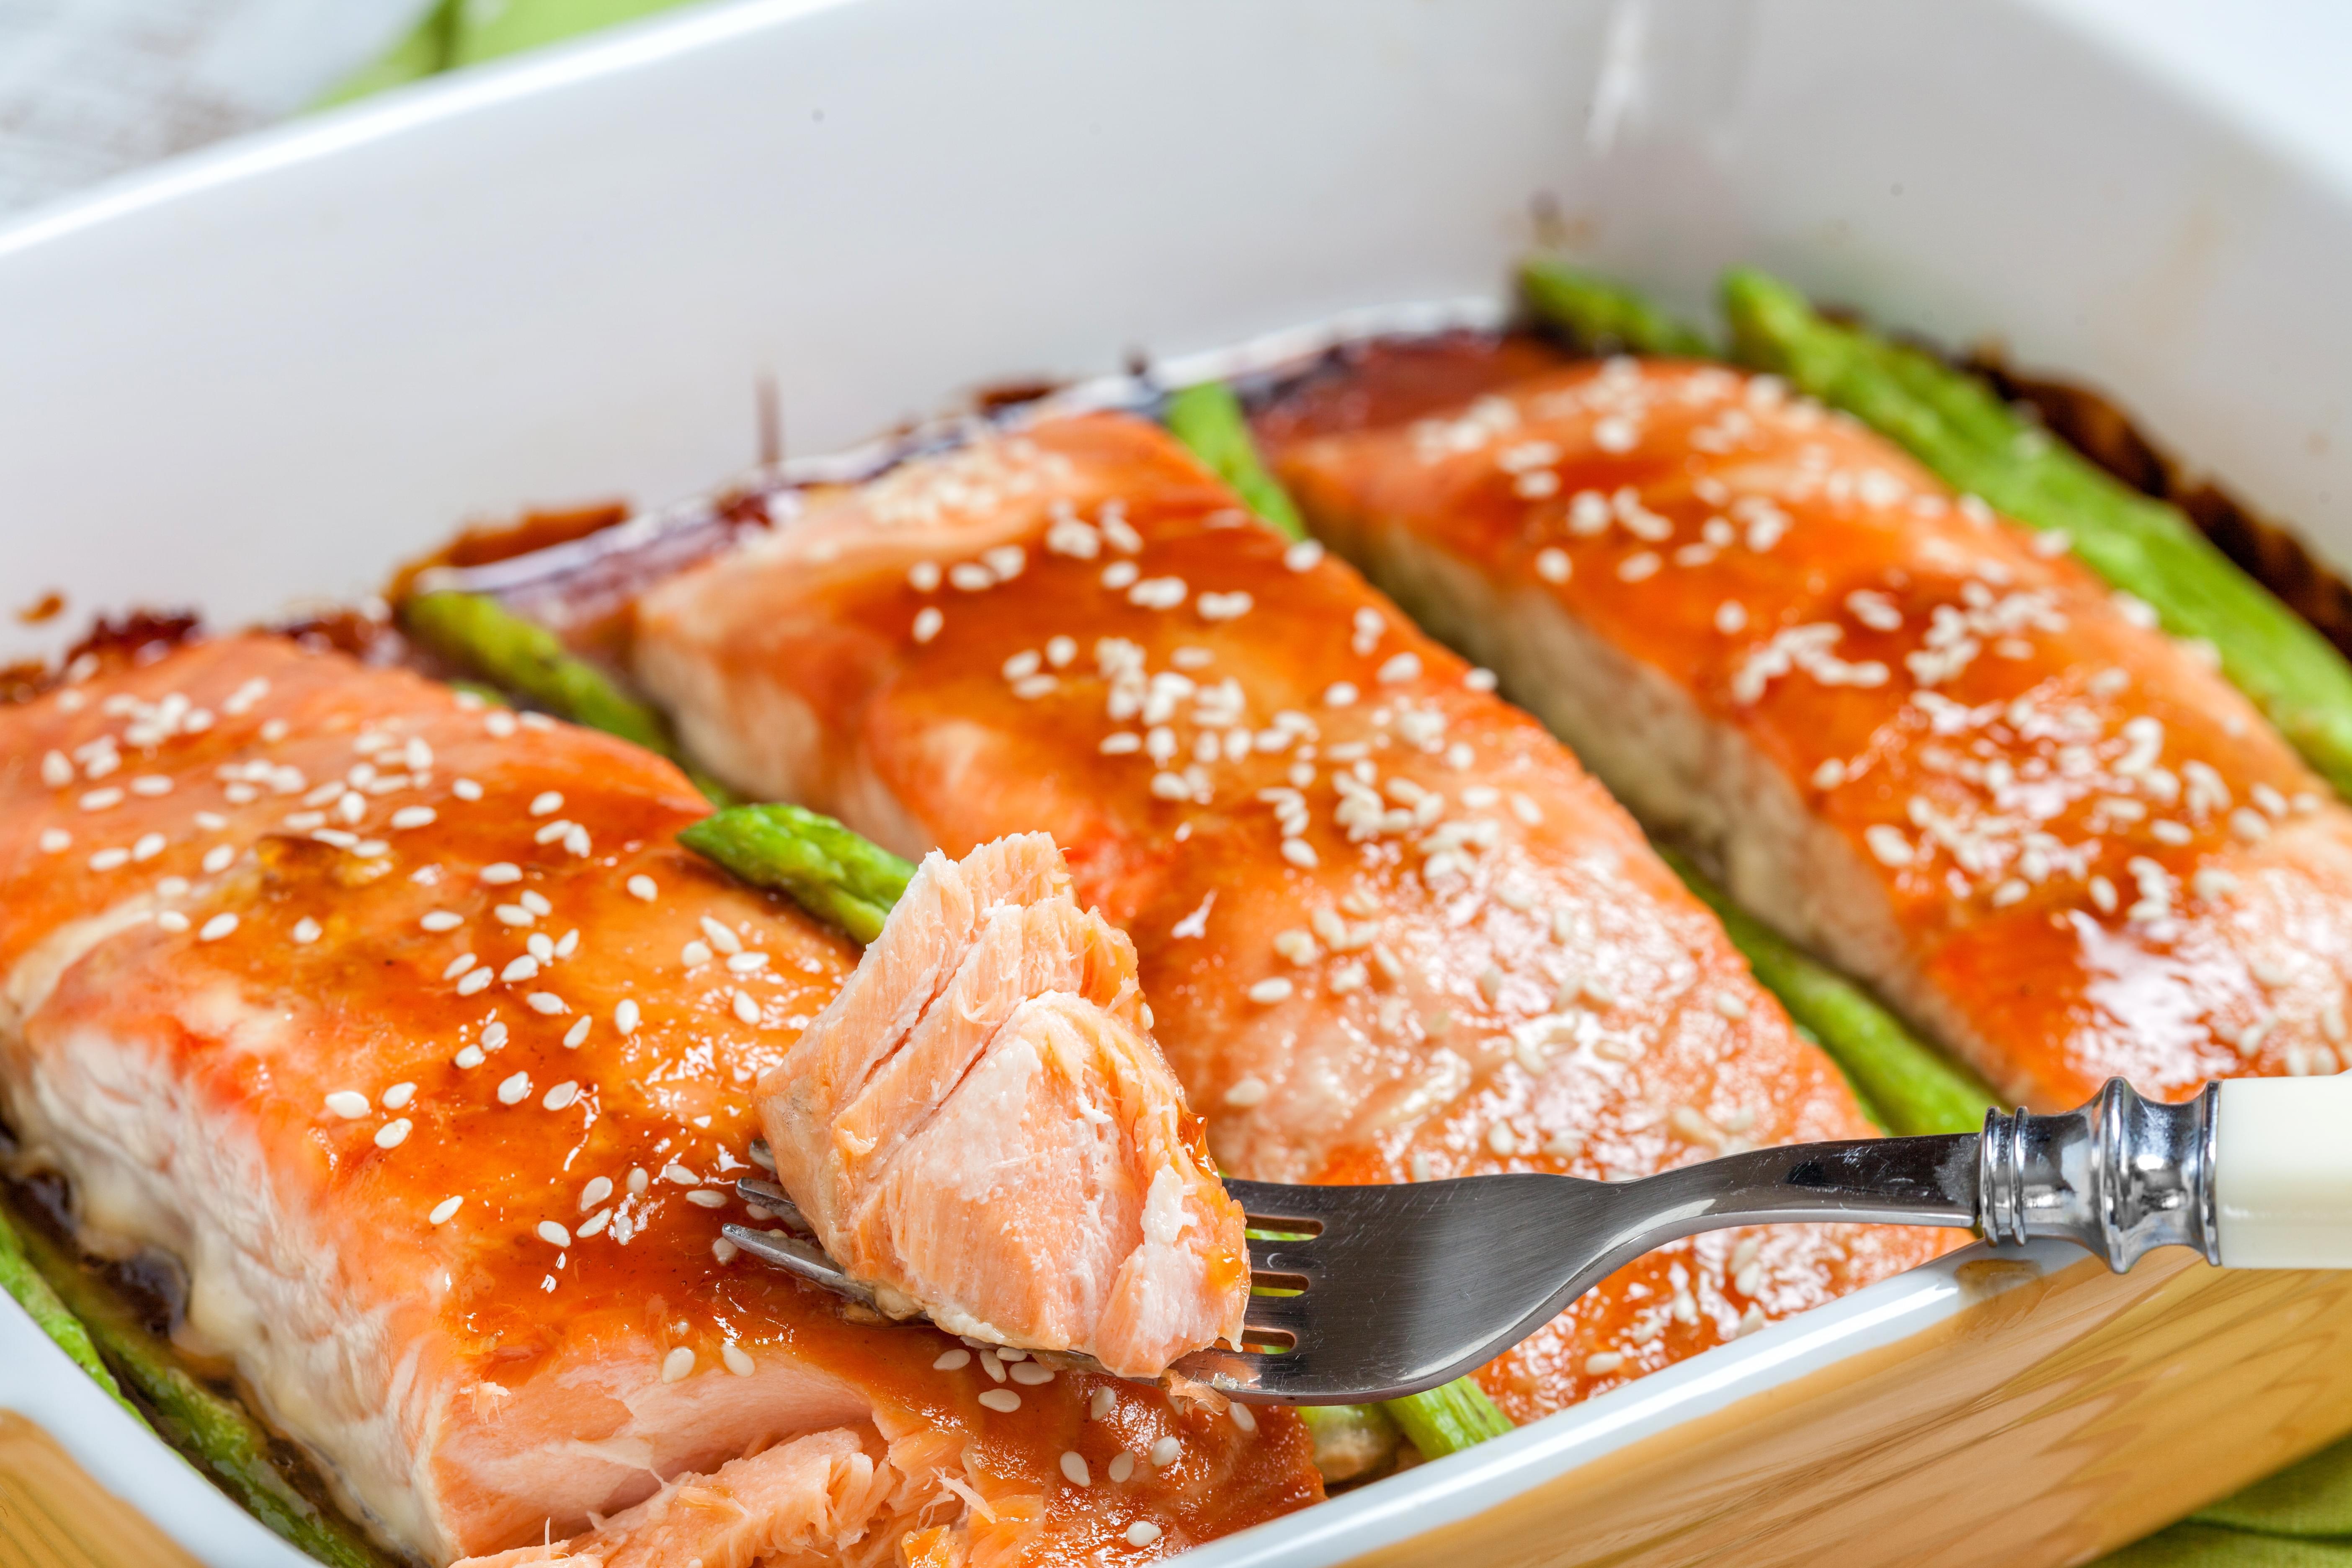 Teriyaki Salmon with Spicy Mayo and Asparagus